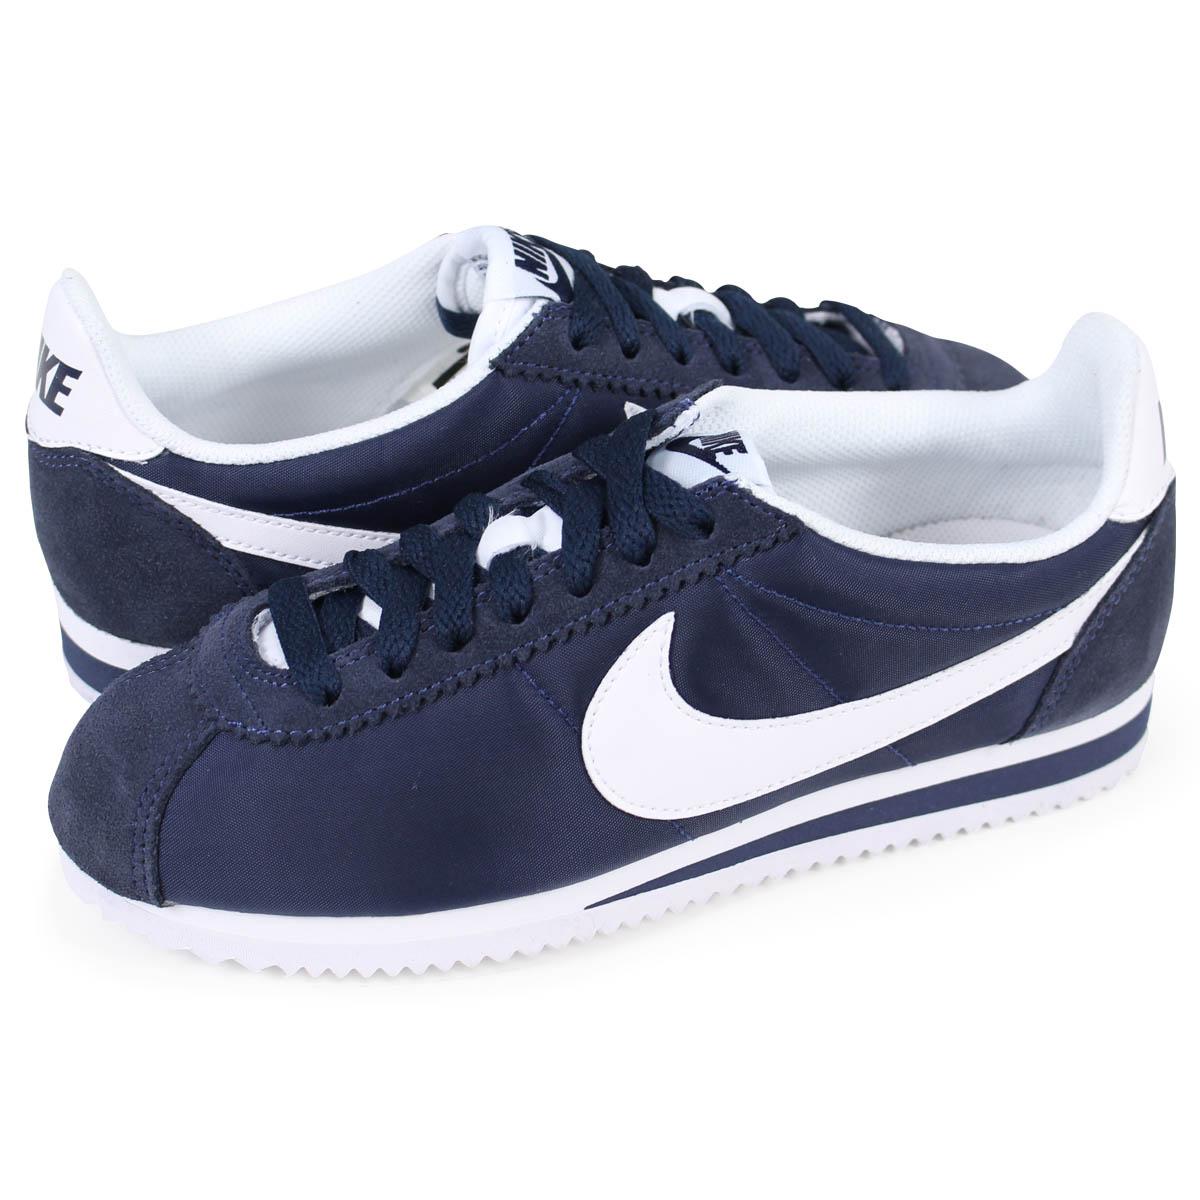 newest bbc32 07b46 Nike NIKE コルテッツクラシックレディーススニーカー WMNS CLASSIC CORTEZ NYLON 749,864-411 navy